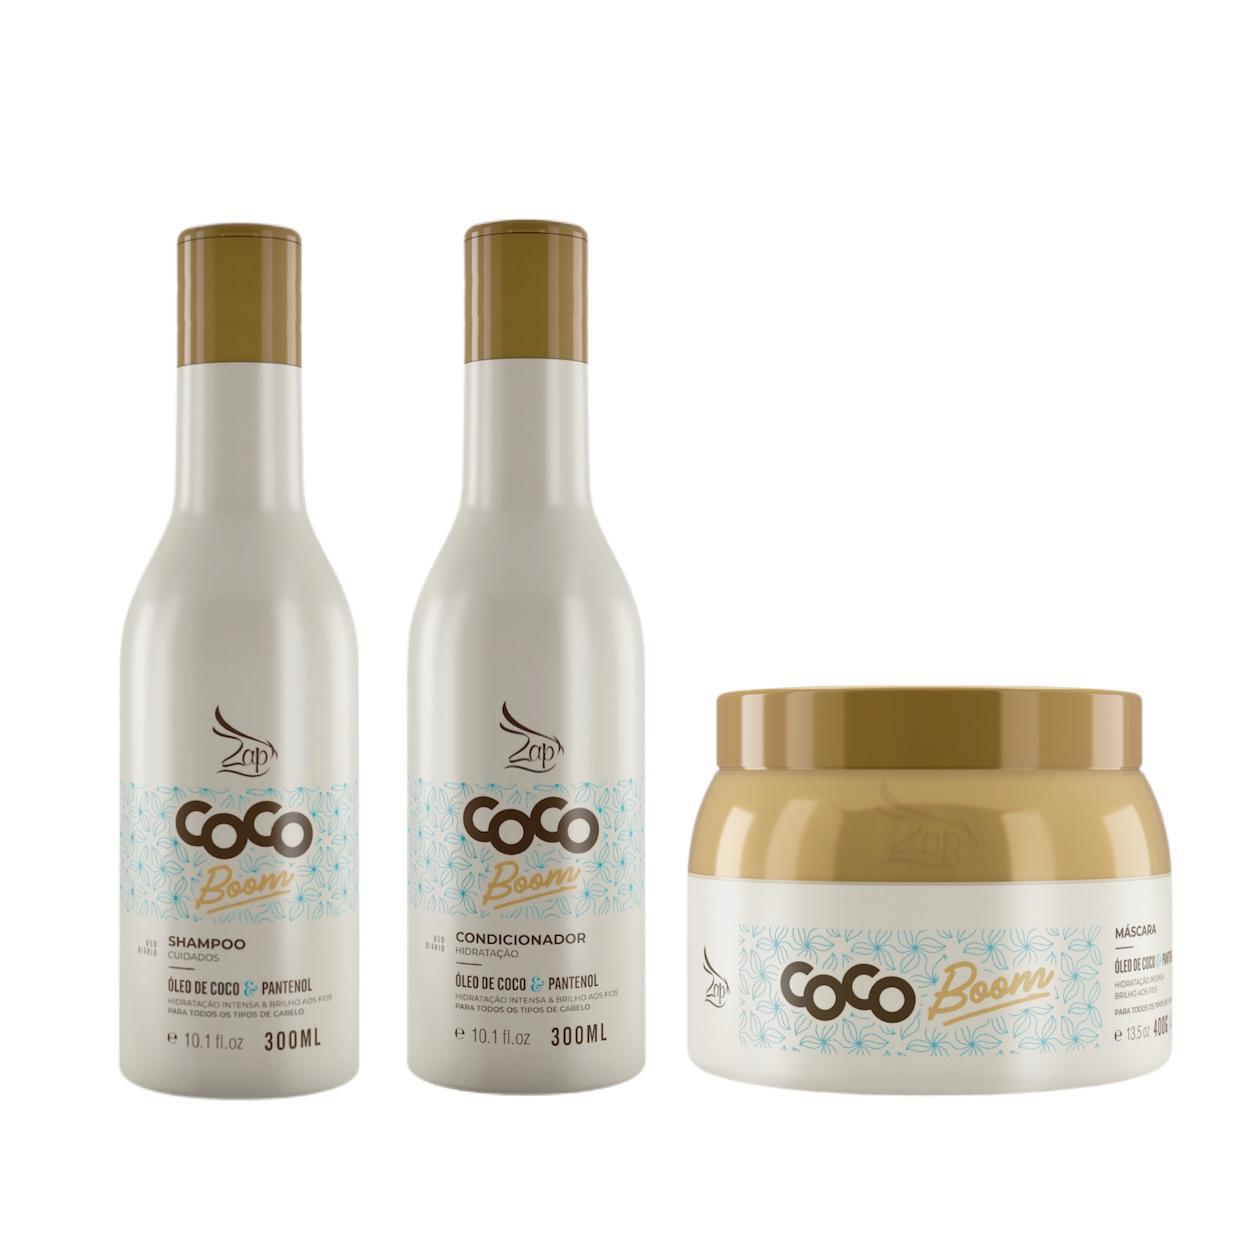 Kit Zap Coco Boom Manutenção 300ml Completo